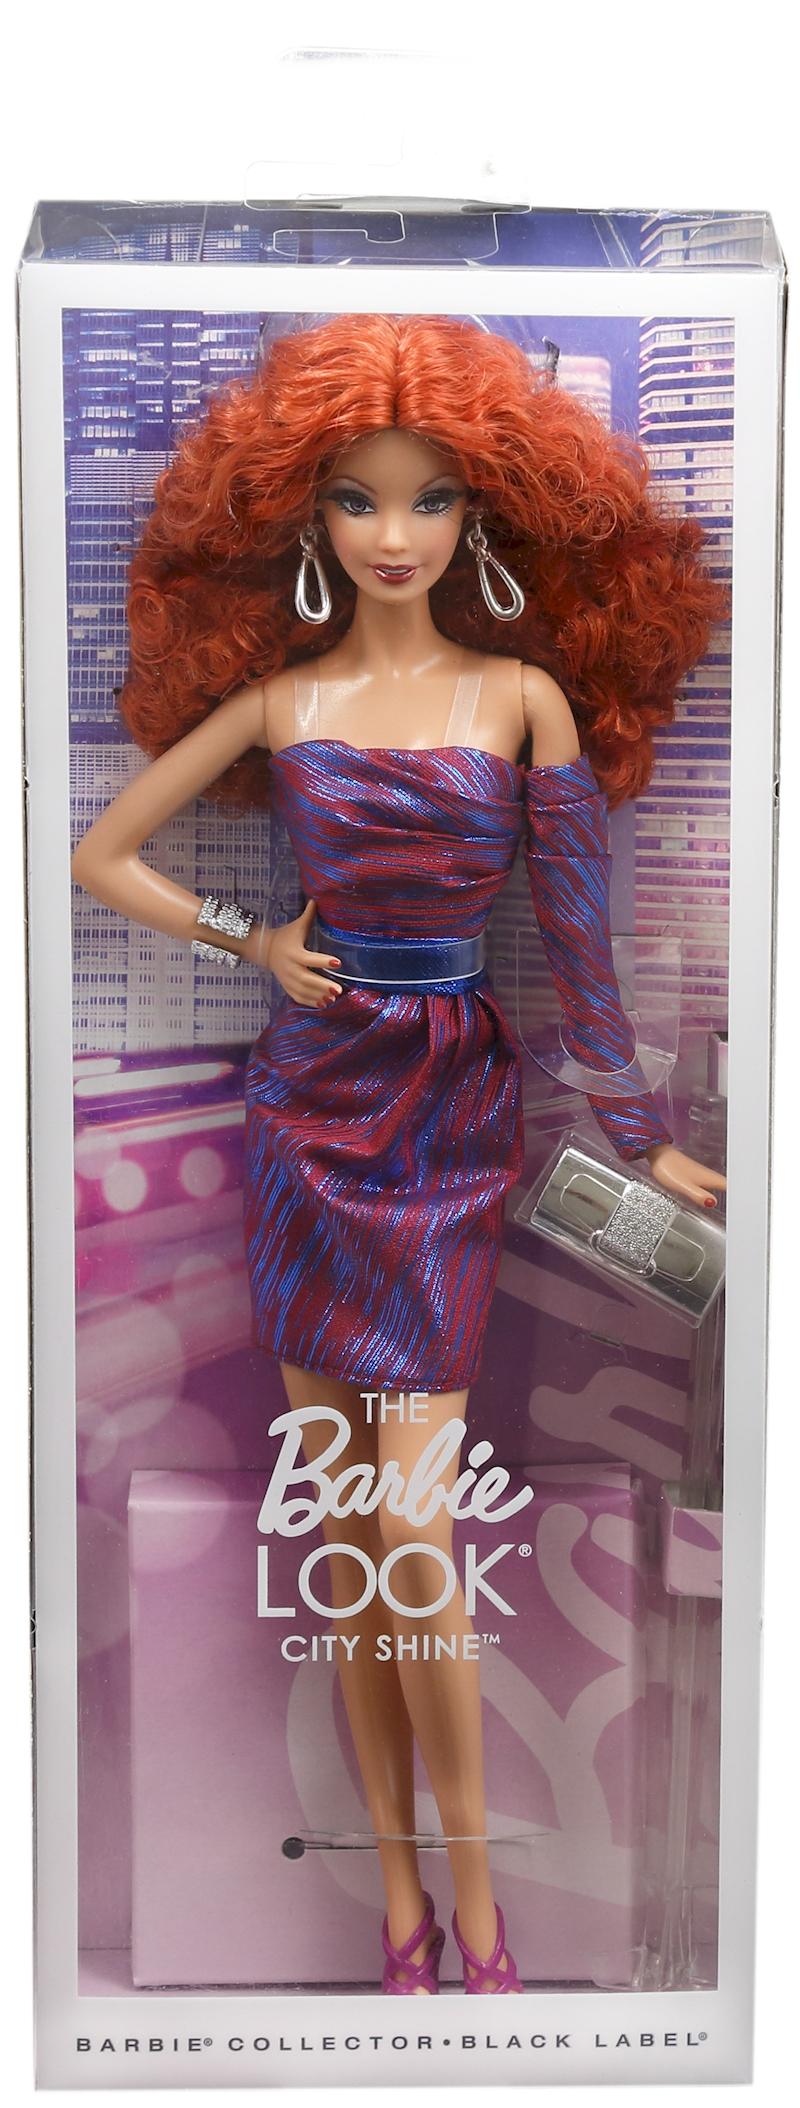 the barbie look city shine barbie doll redhead - Barbie Fe